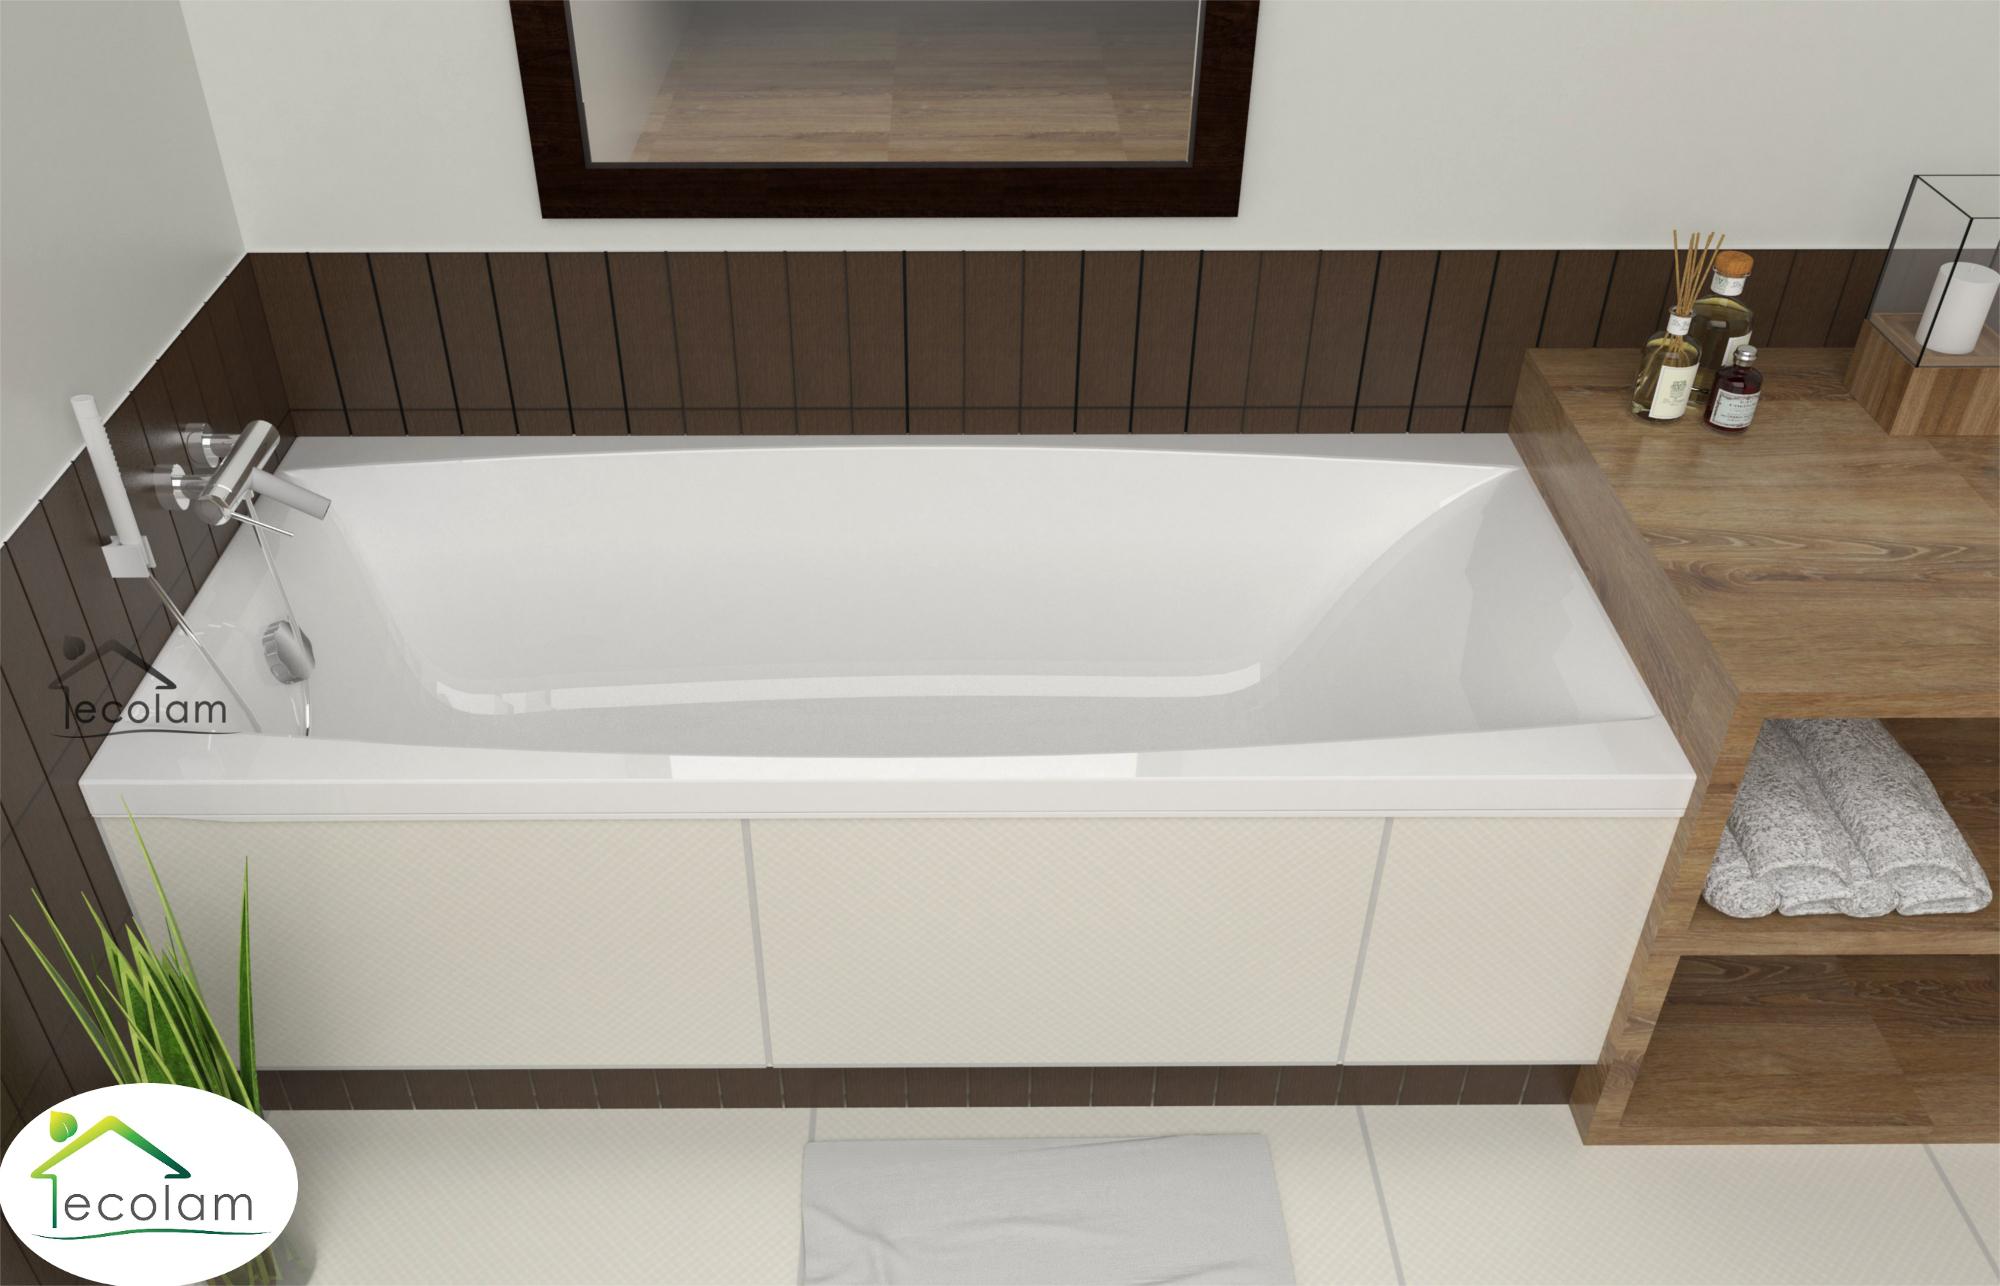 badewanne wanne rechteck acryl 180 x 80 cm f e ab. Black Bedroom Furniture Sets. Home Design Ideas